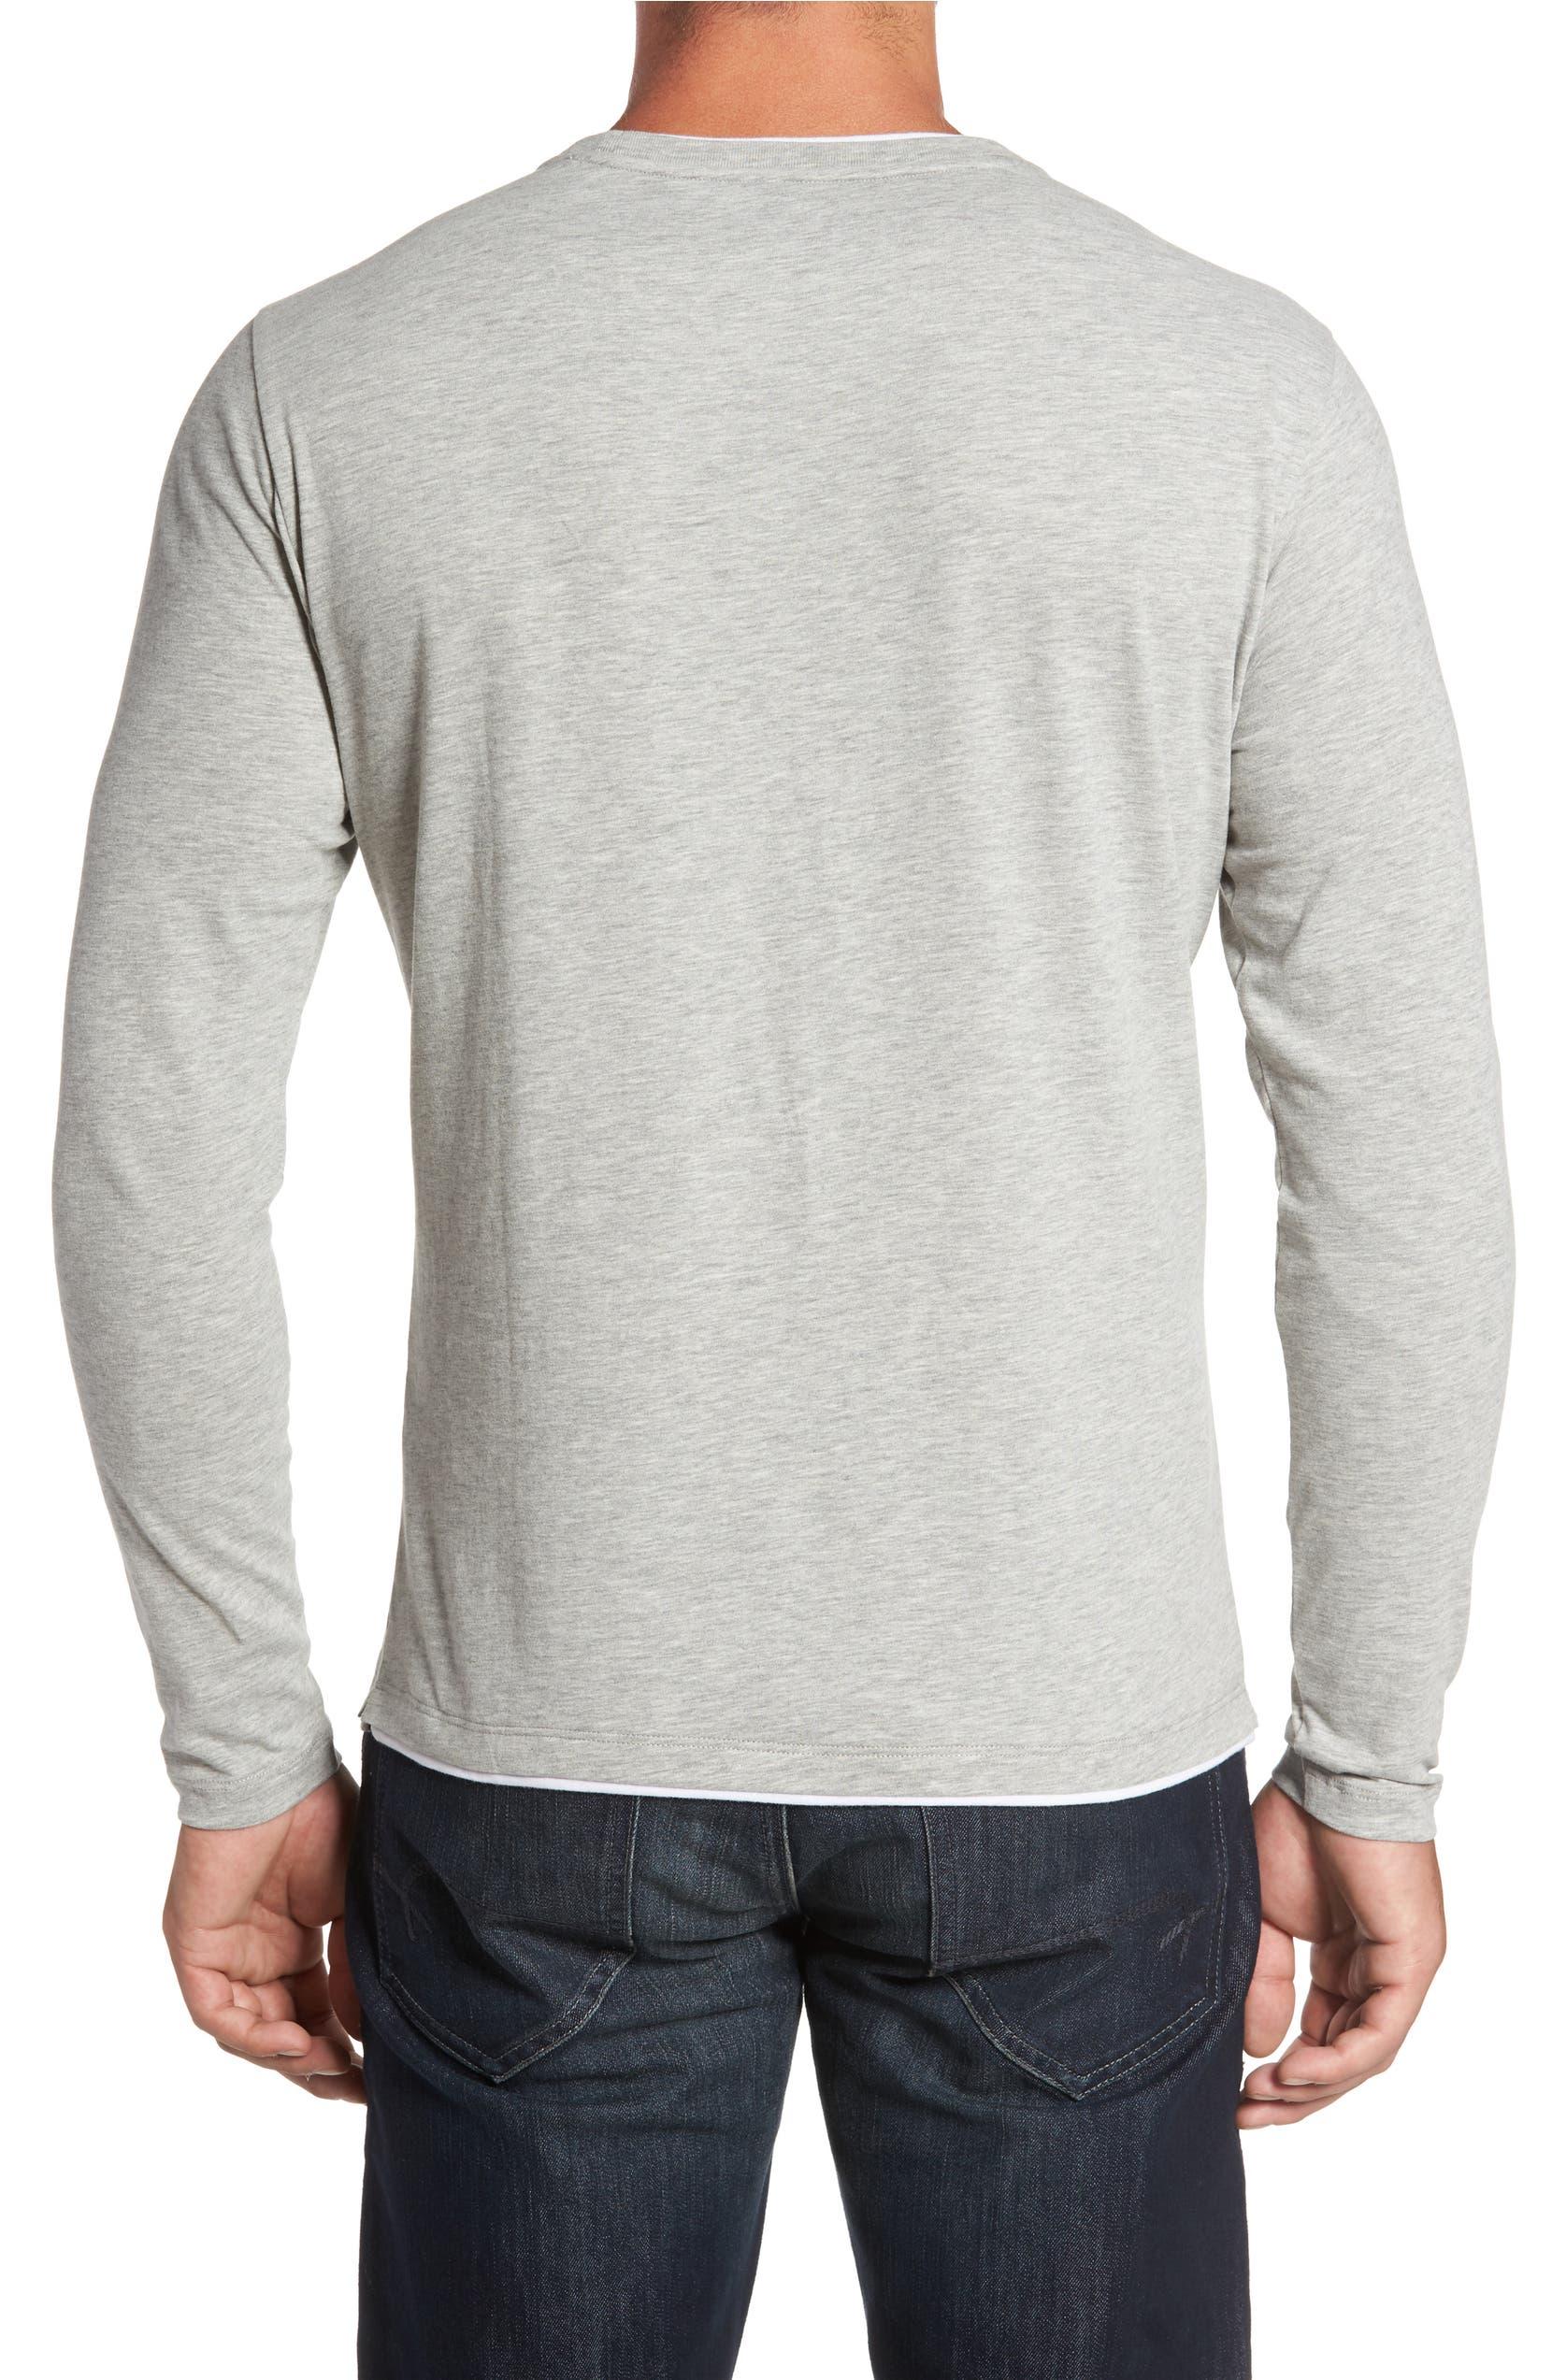 e6da5abb45f3bf Robert Barakett Halifax Long Sleeve Crewneck T-Shirt